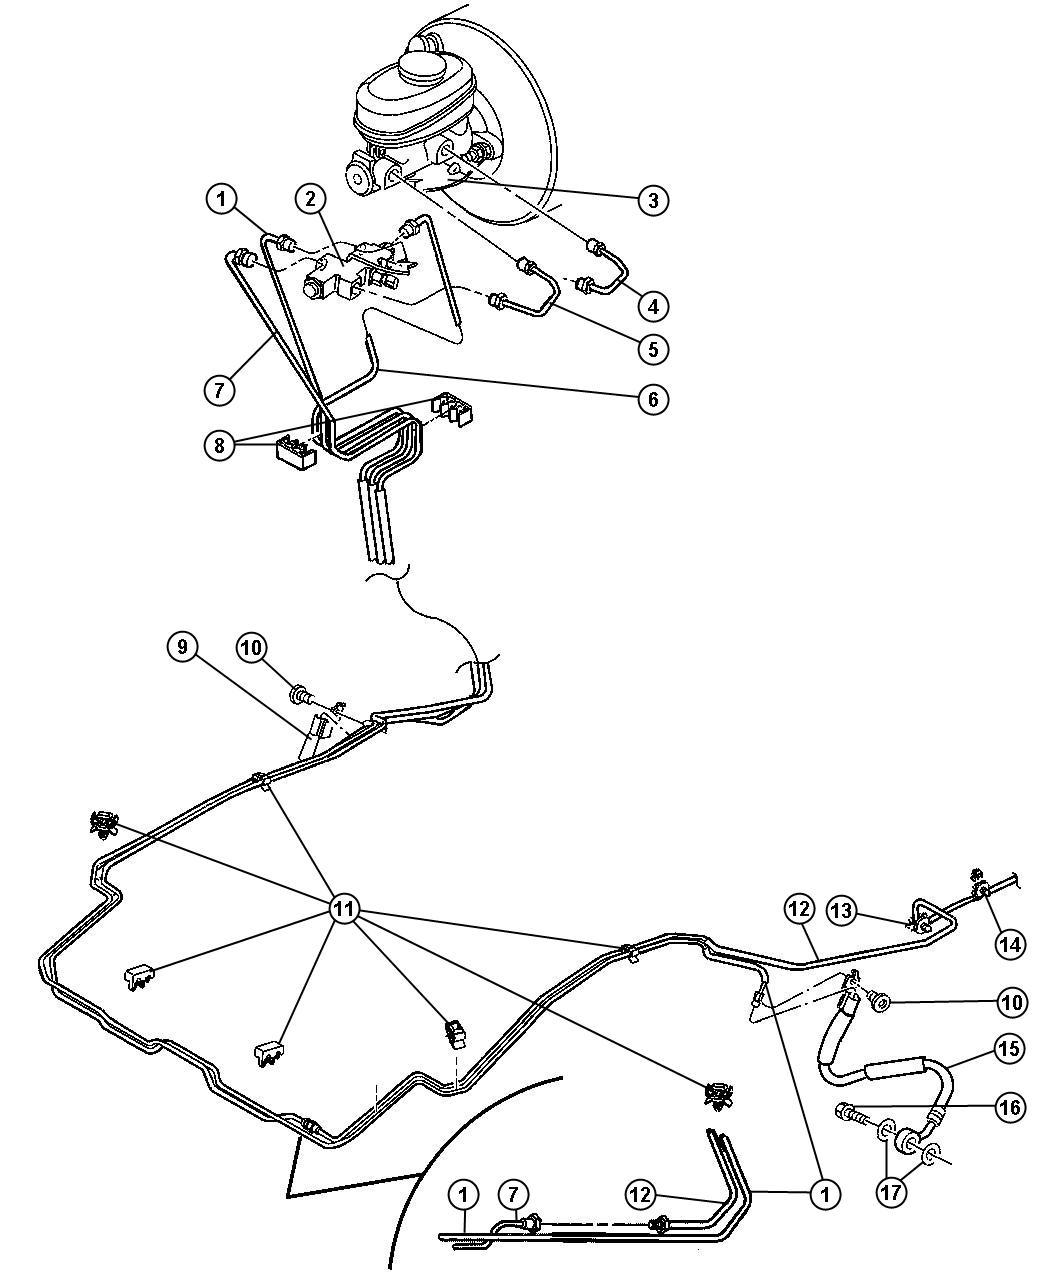 Jeep Wrangler Tube. Brake. Secondary. Hcu to proportioning